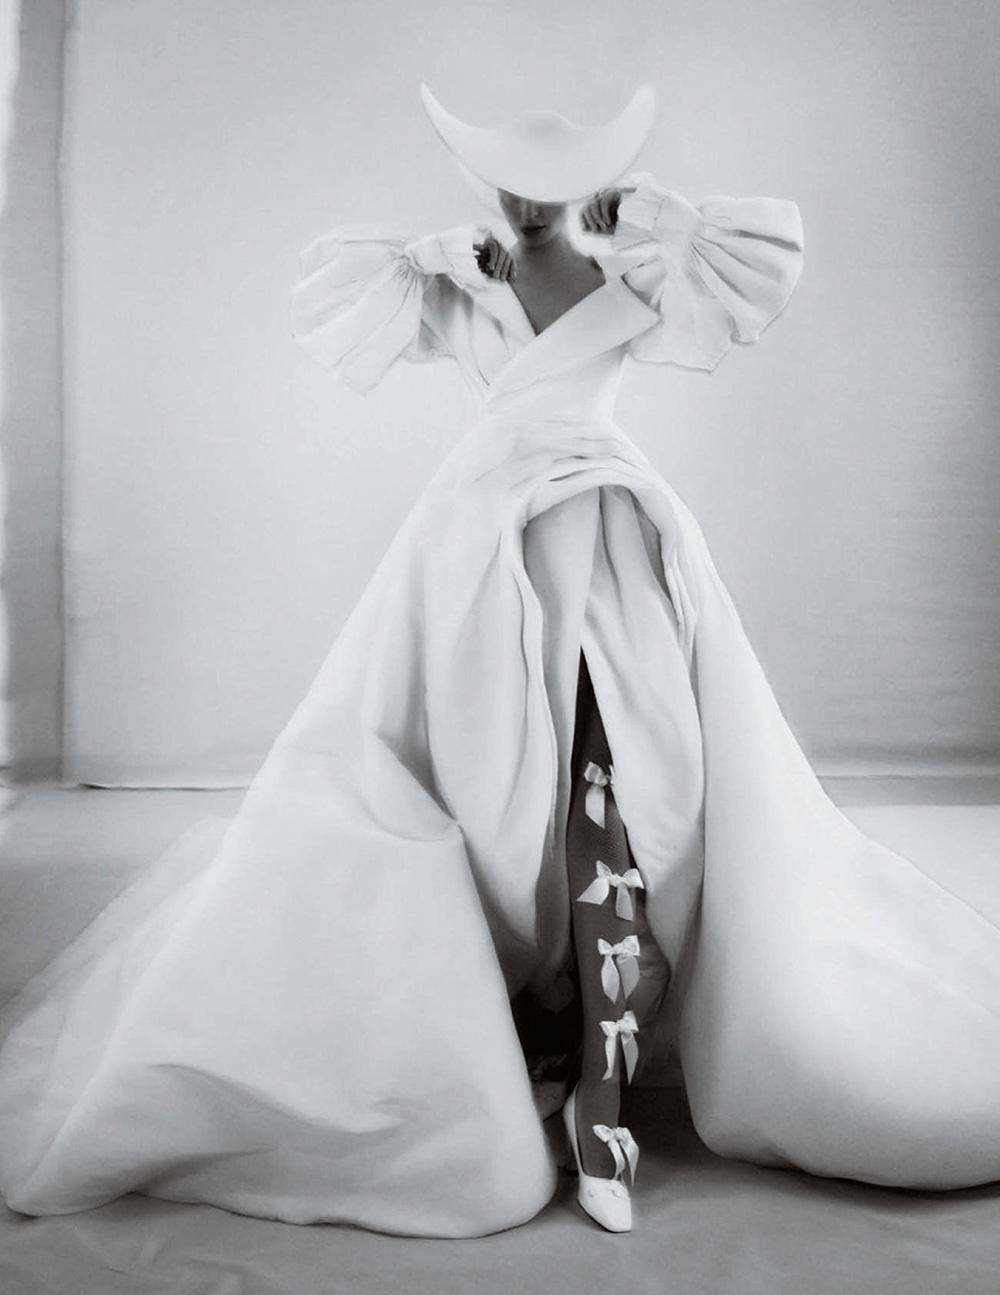 Amber Valletta covers Vogue Spain December 2020 by Txema Yeste